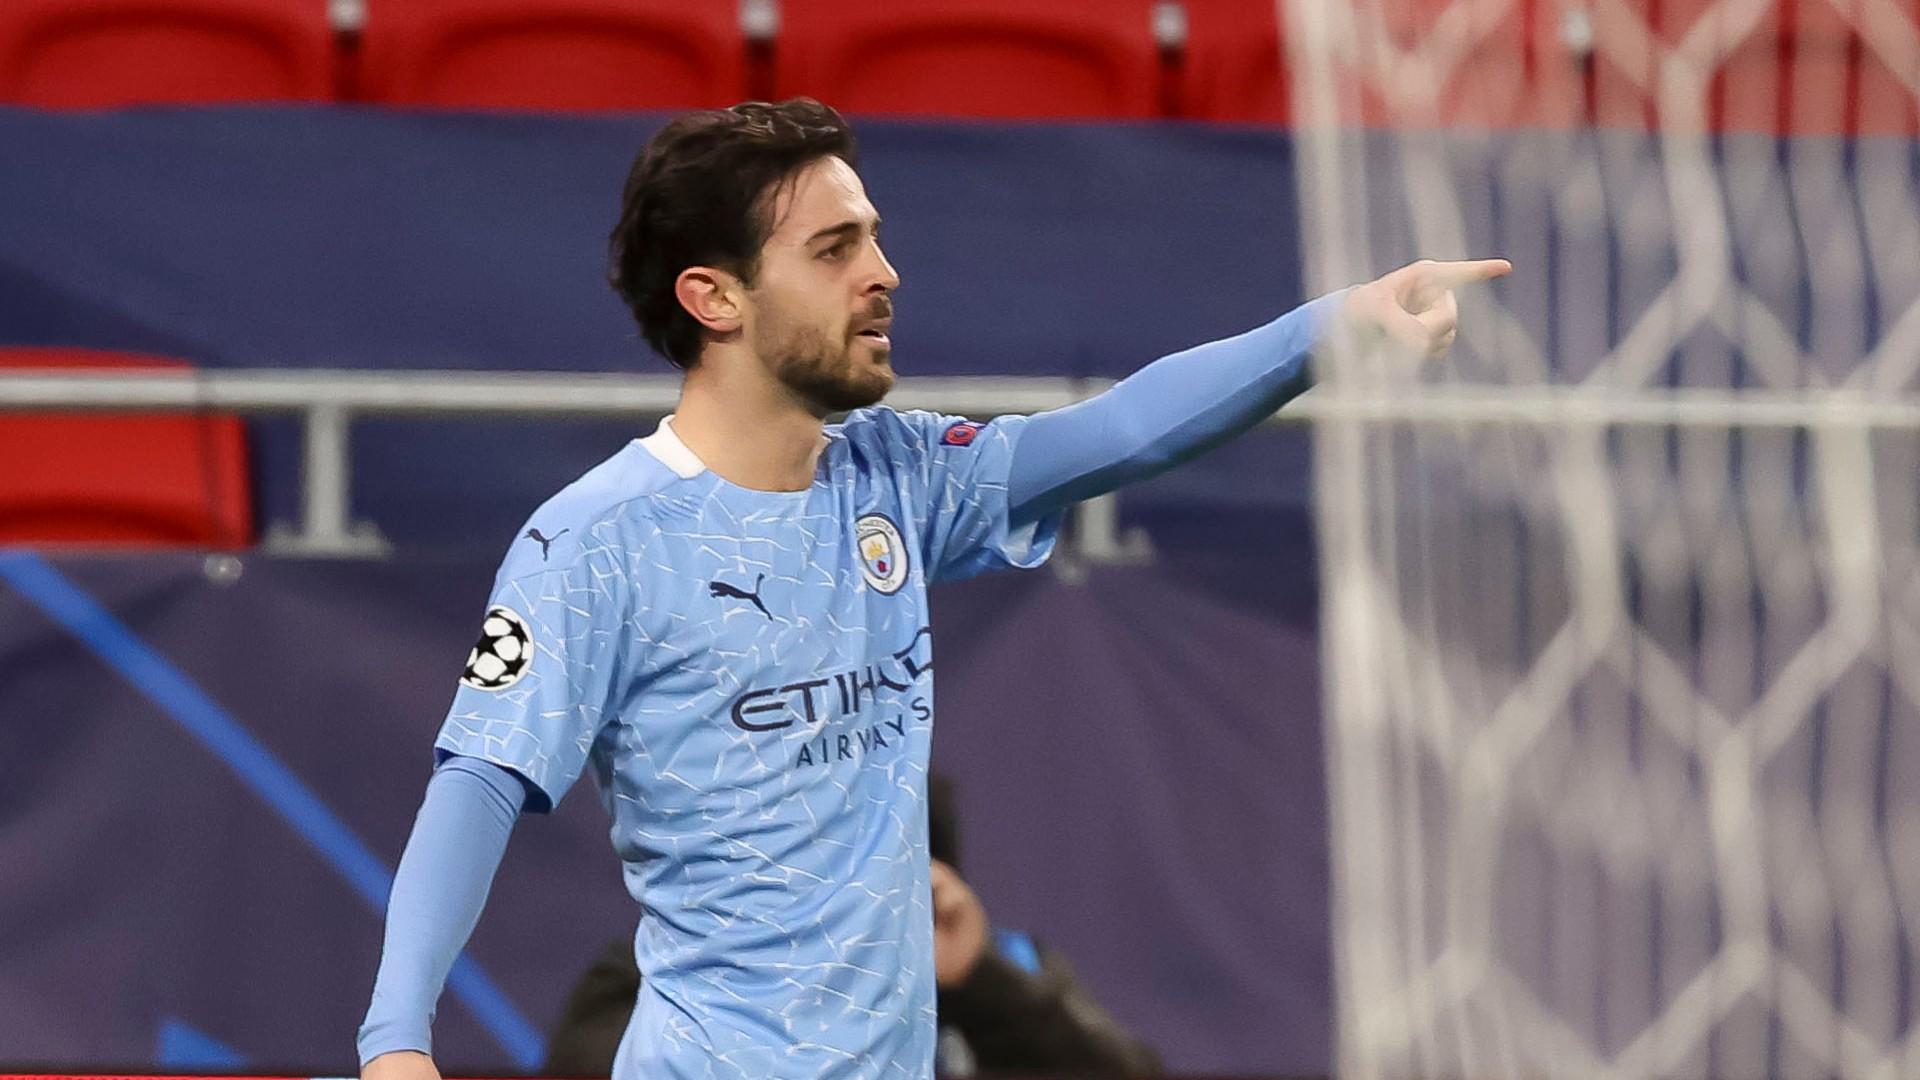 Borussia Monchengladbach 0-2 Manchester City: Silva and Jesus strike as Cancelo shines